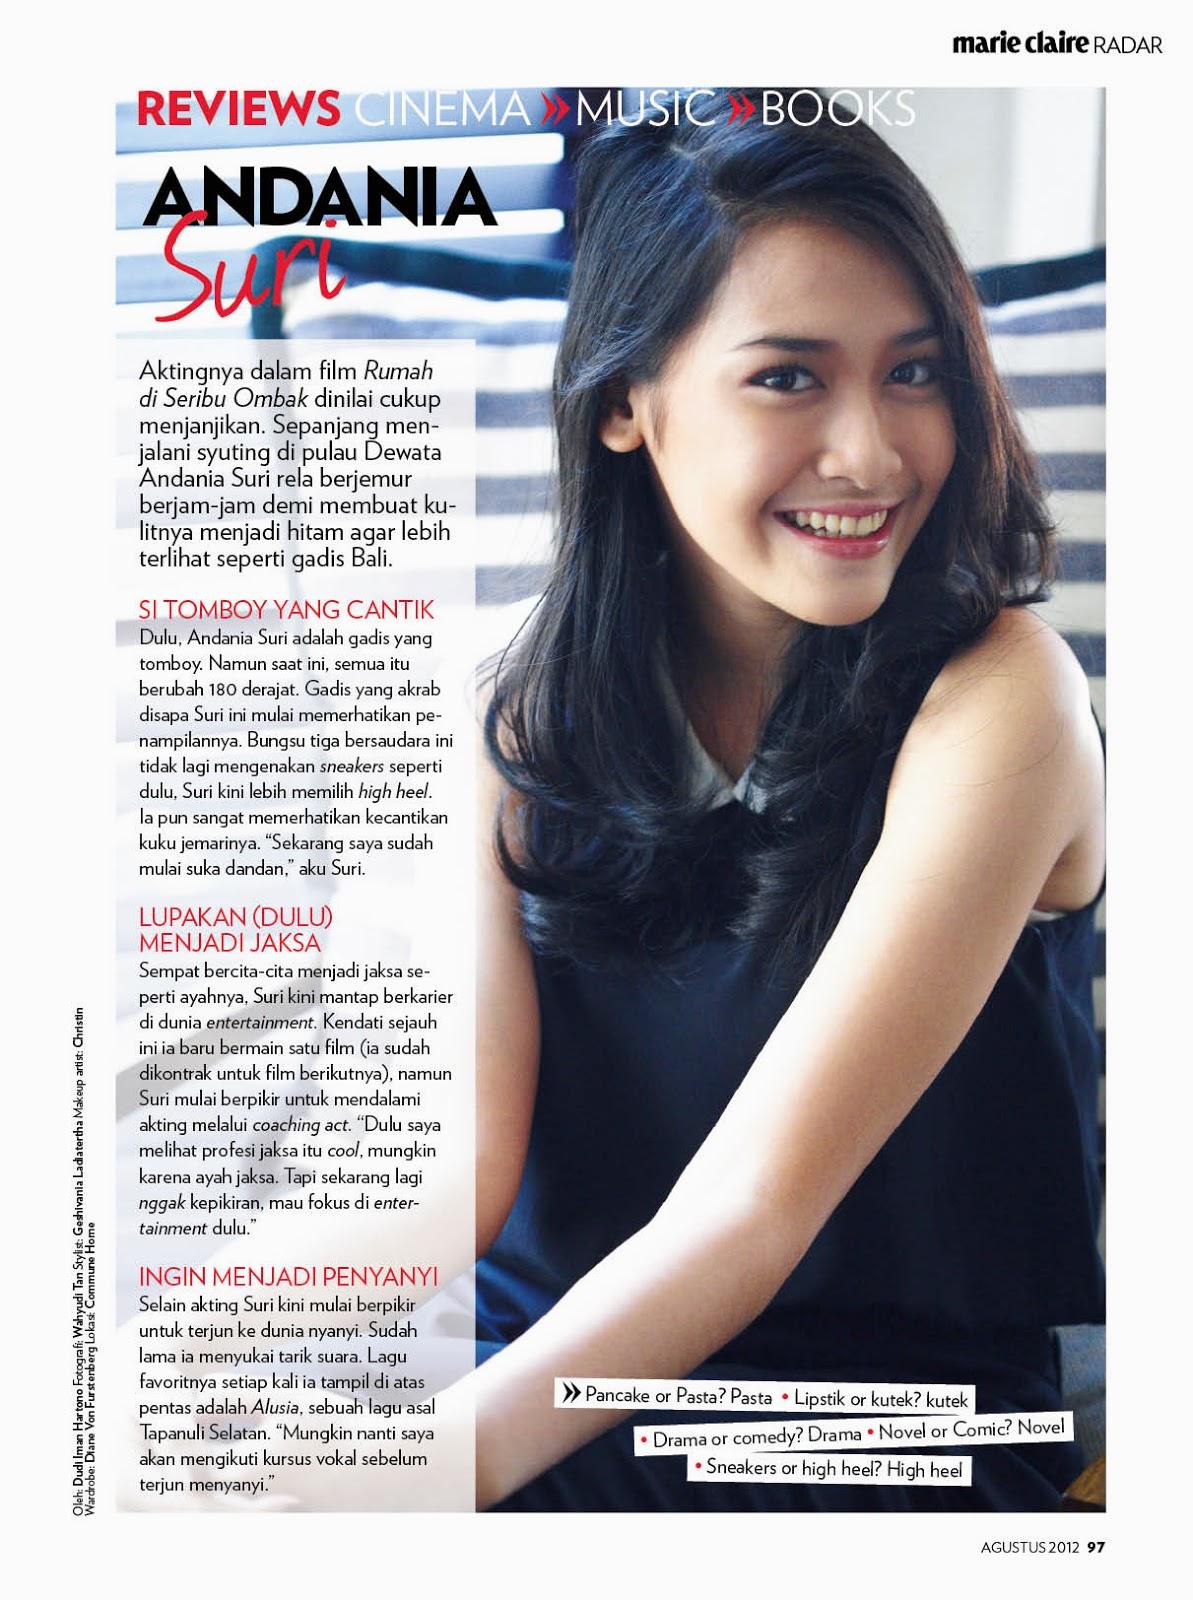 Andania Suri With Marie Claire Indonesia